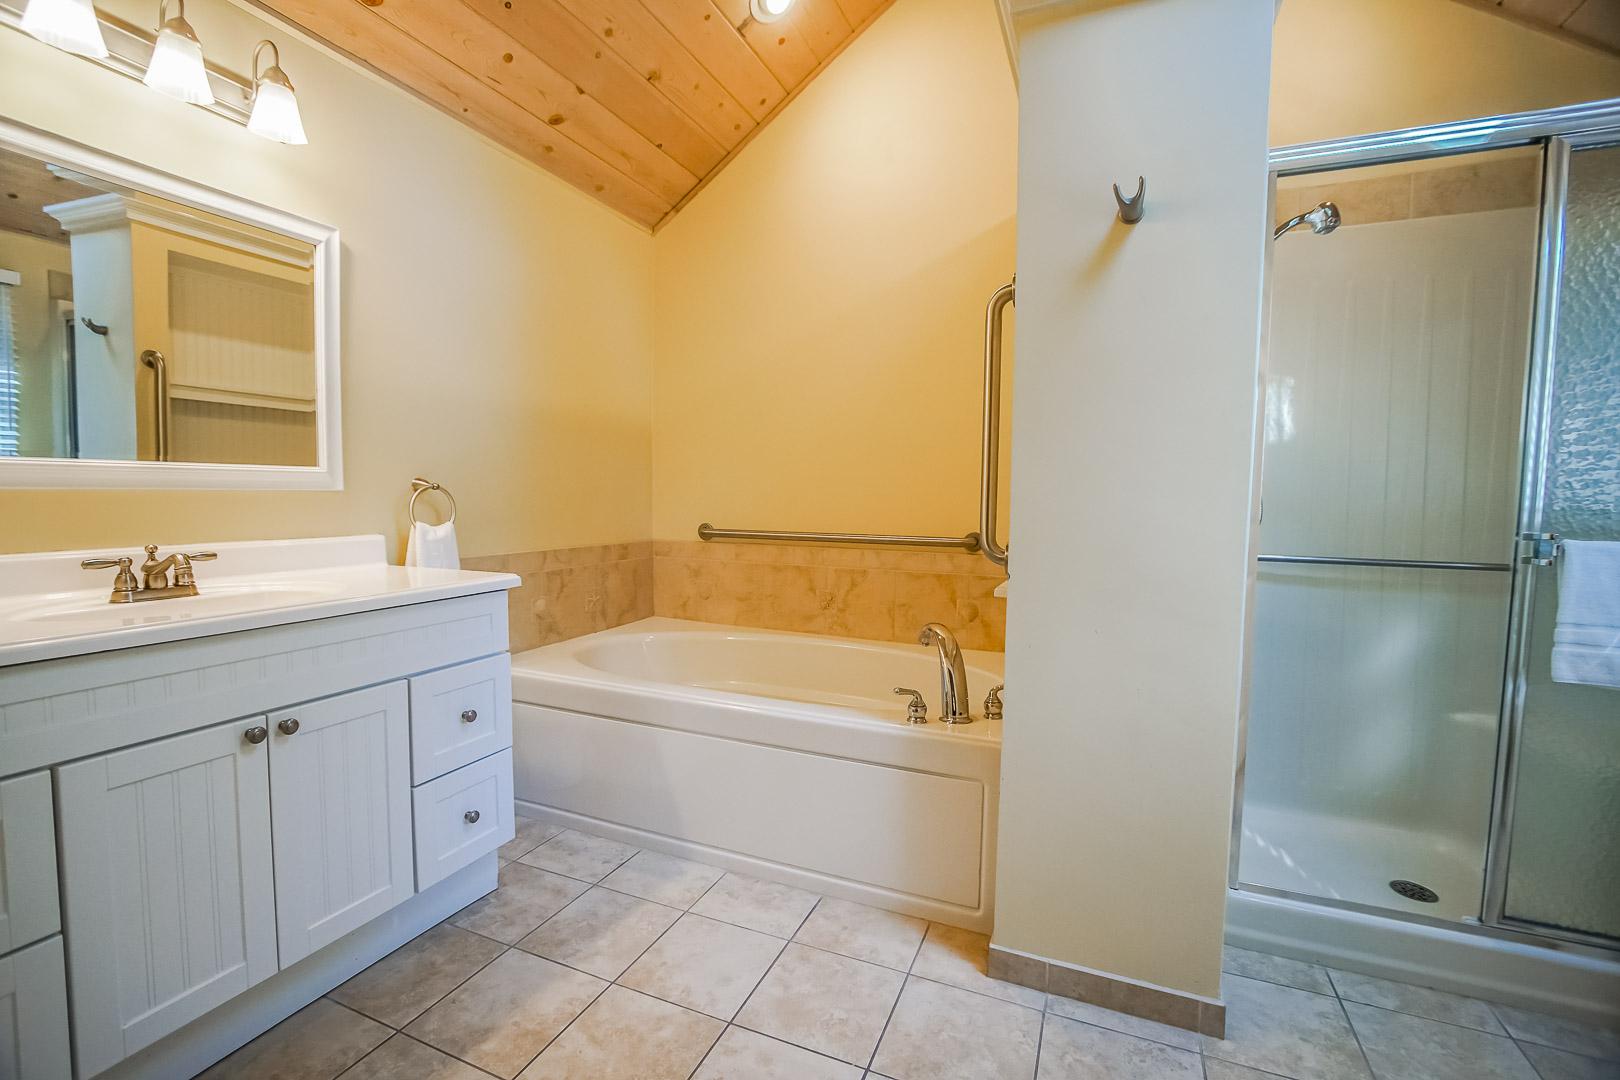 A renovated full size bathroom at VRI's Cape Cod Holiday Estates in Massachusetts.